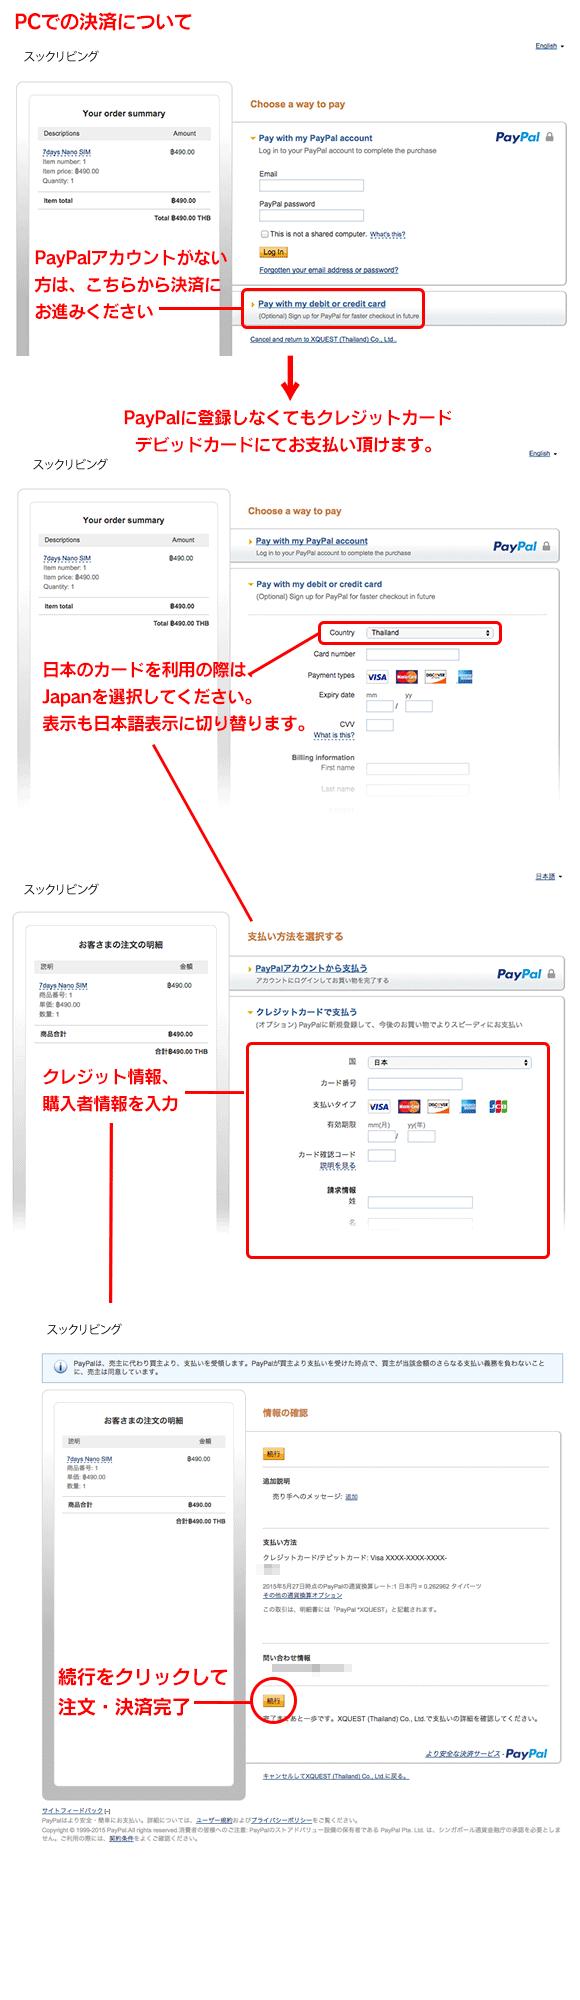 paypalでの支払い方法の説明画像1